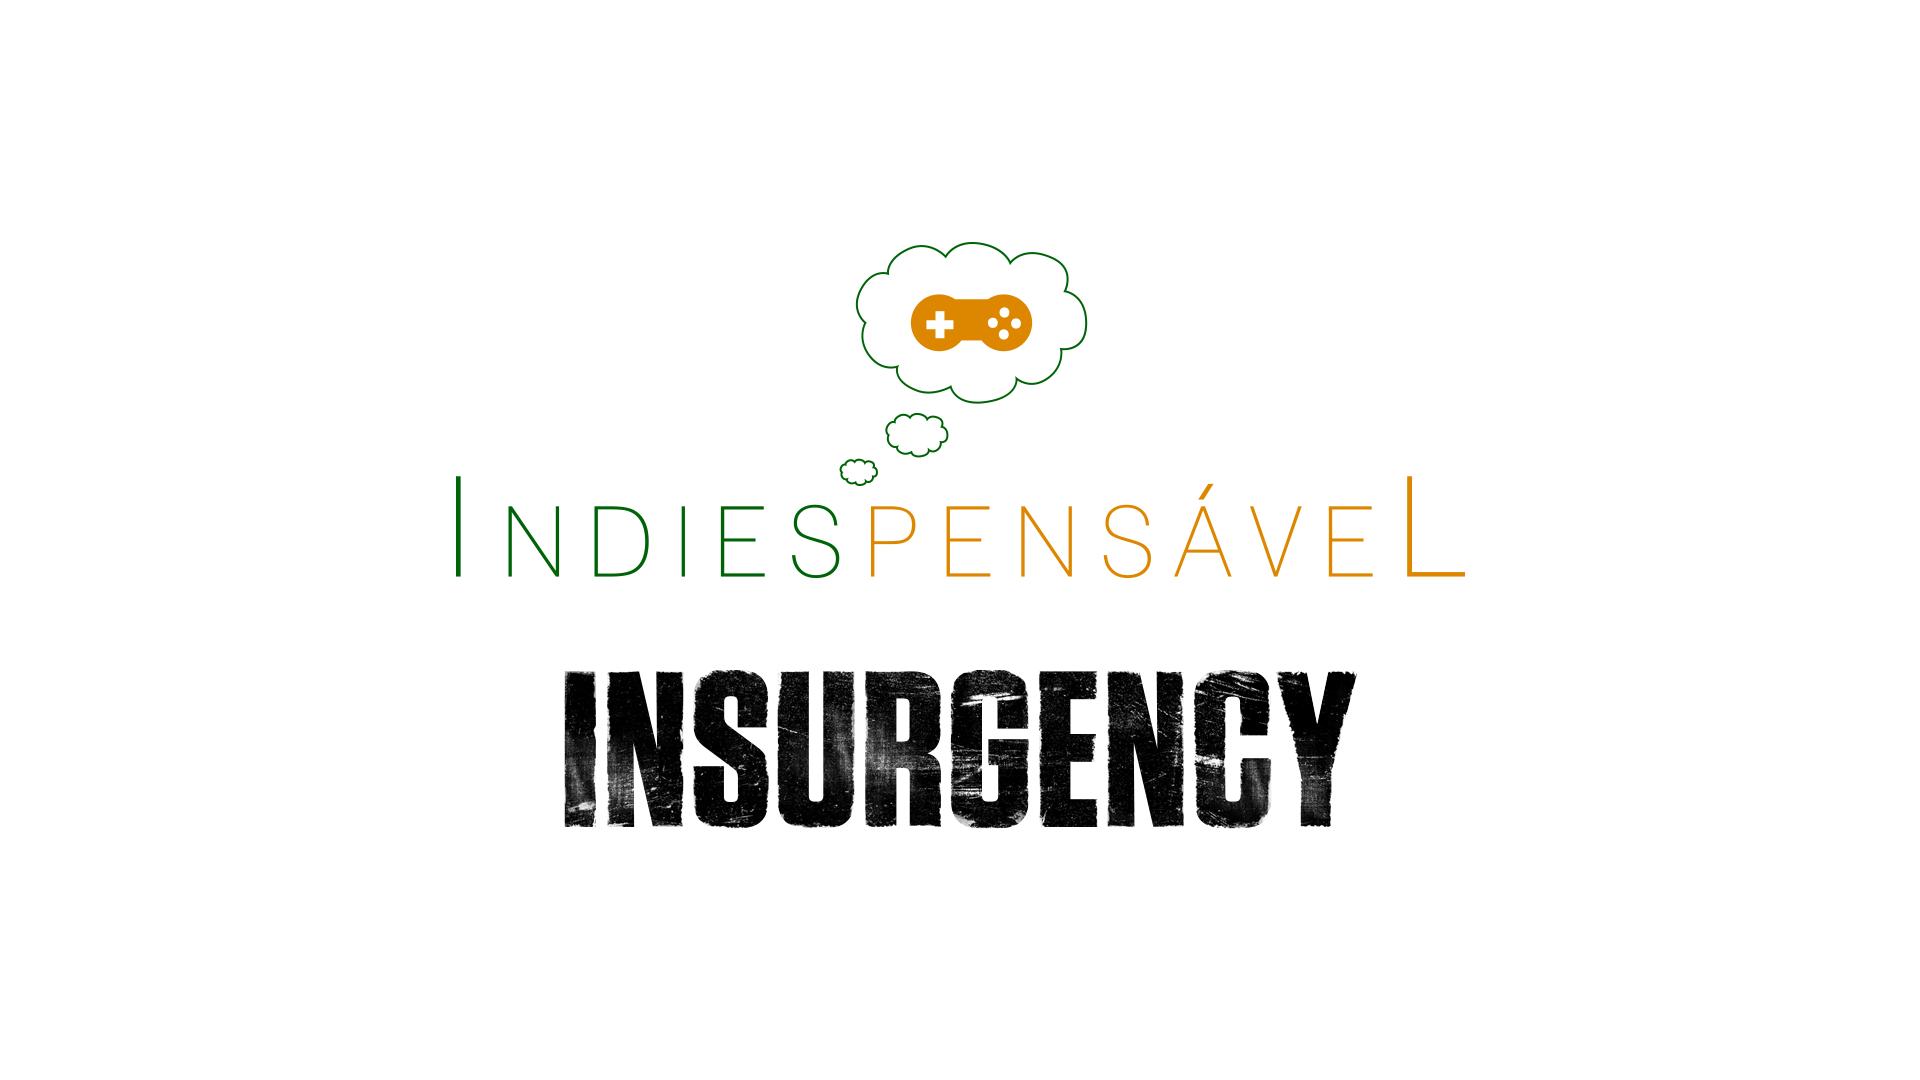 IndieTítulo - Insurgency